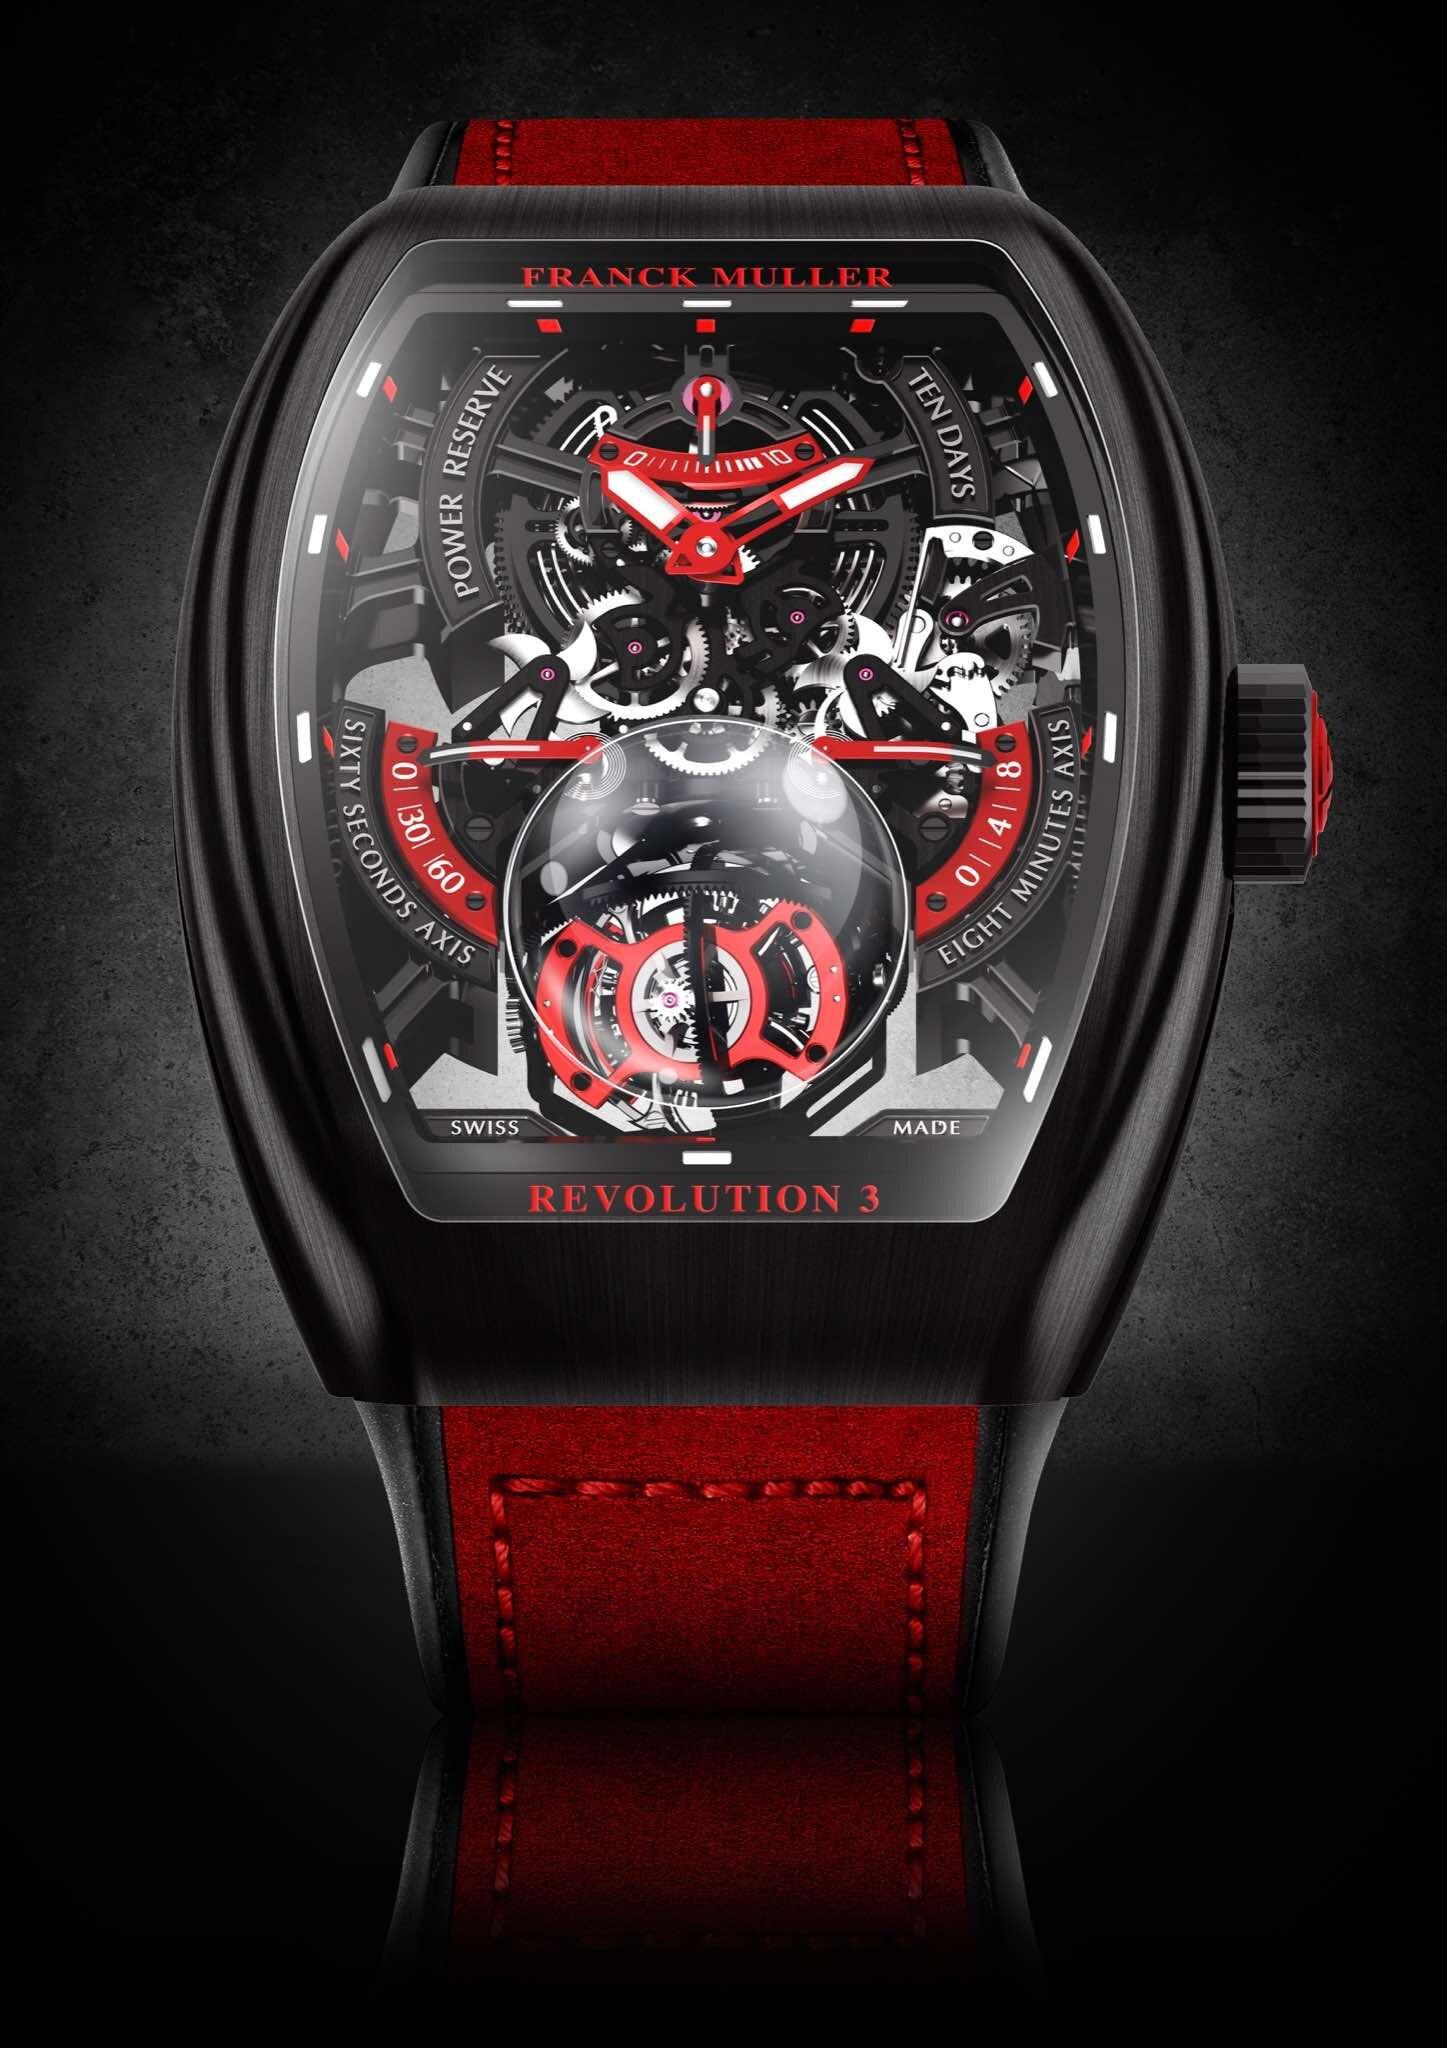 Franck Muller Official Website Haute Horlogerie Watches